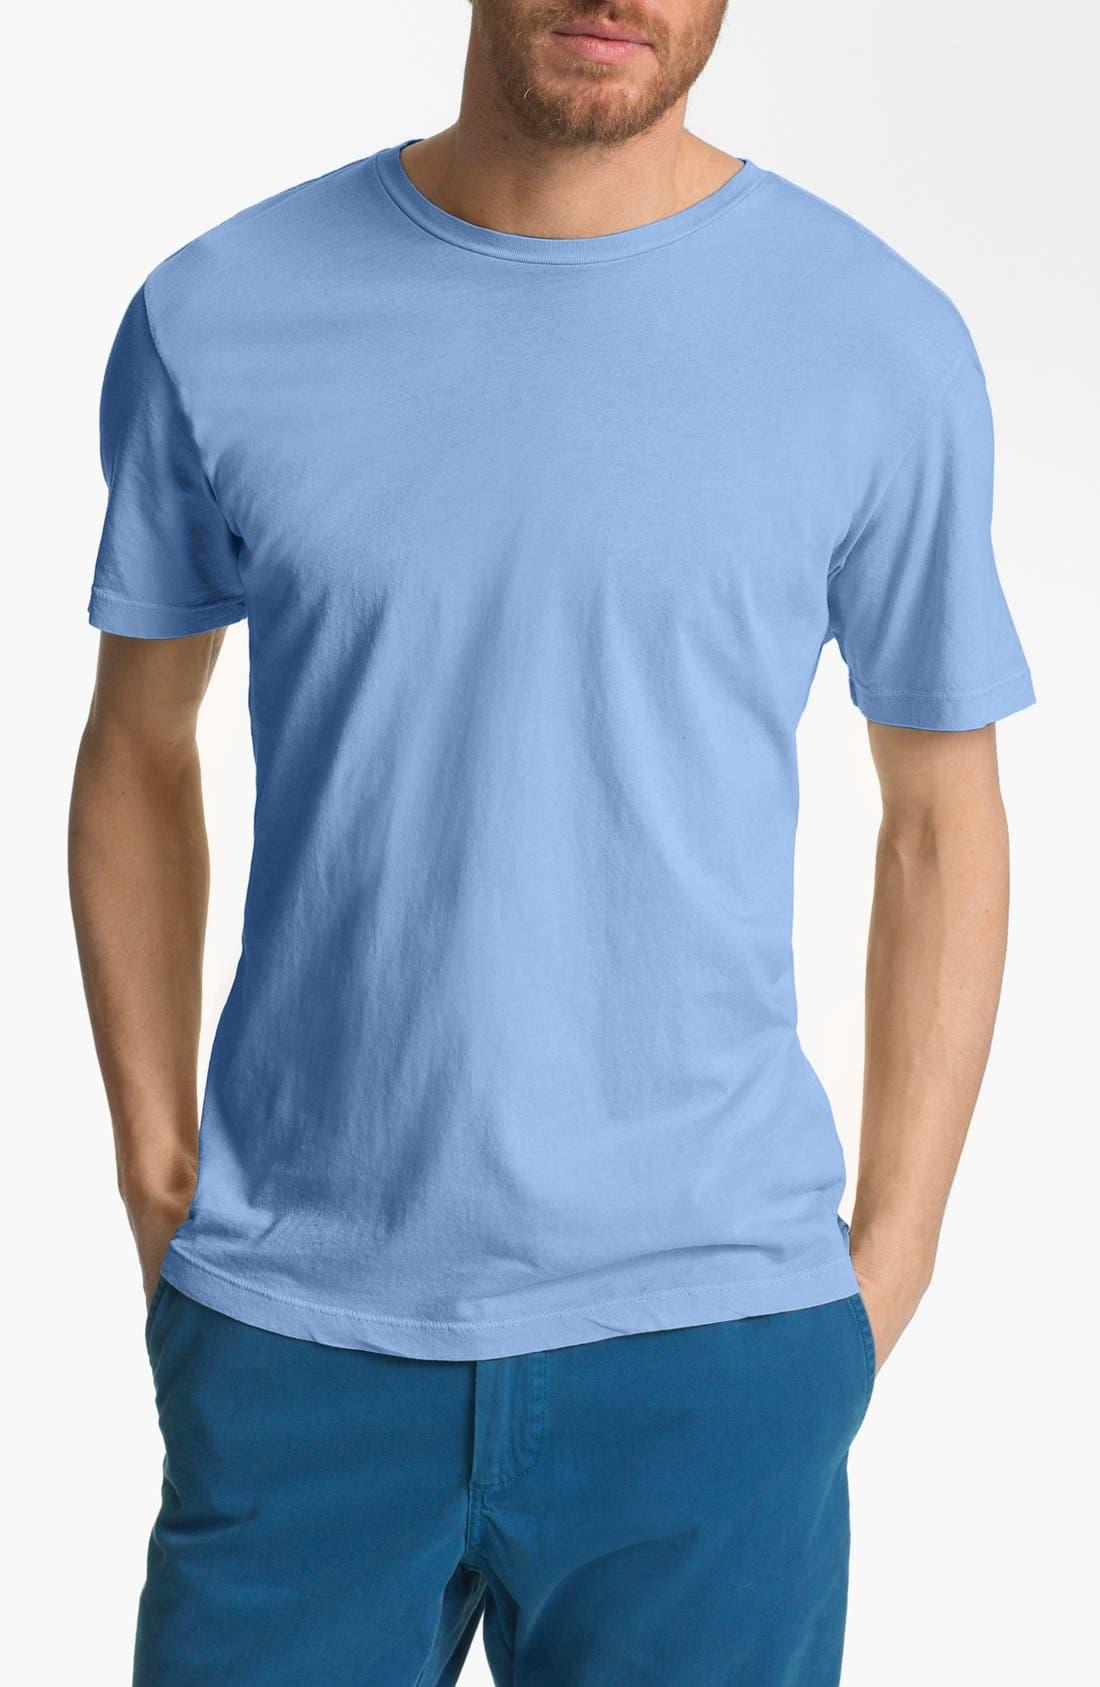 Main Image - Wallin & Bros. Trim Fit Crewneck T-Shirt